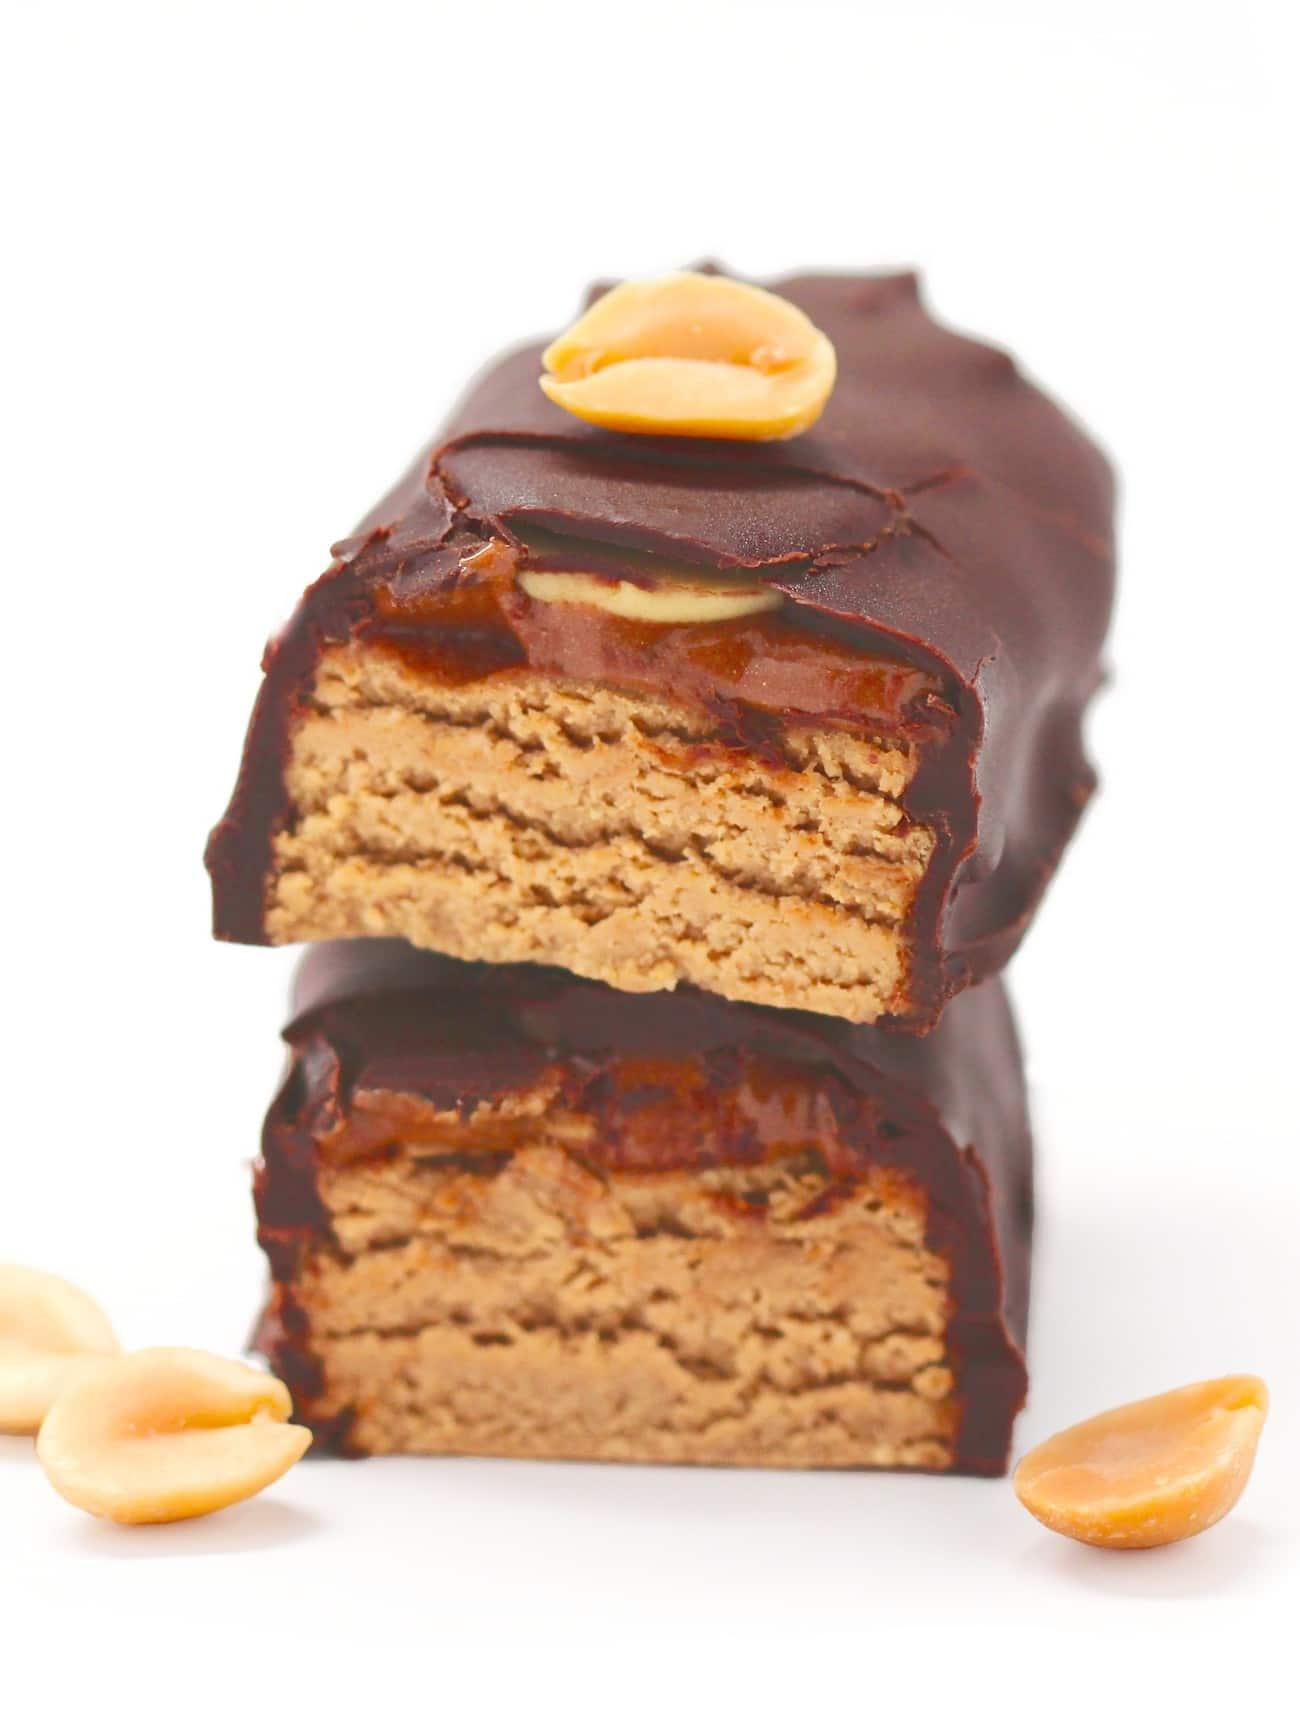 Healthy Snickerz DIY Protein Bars